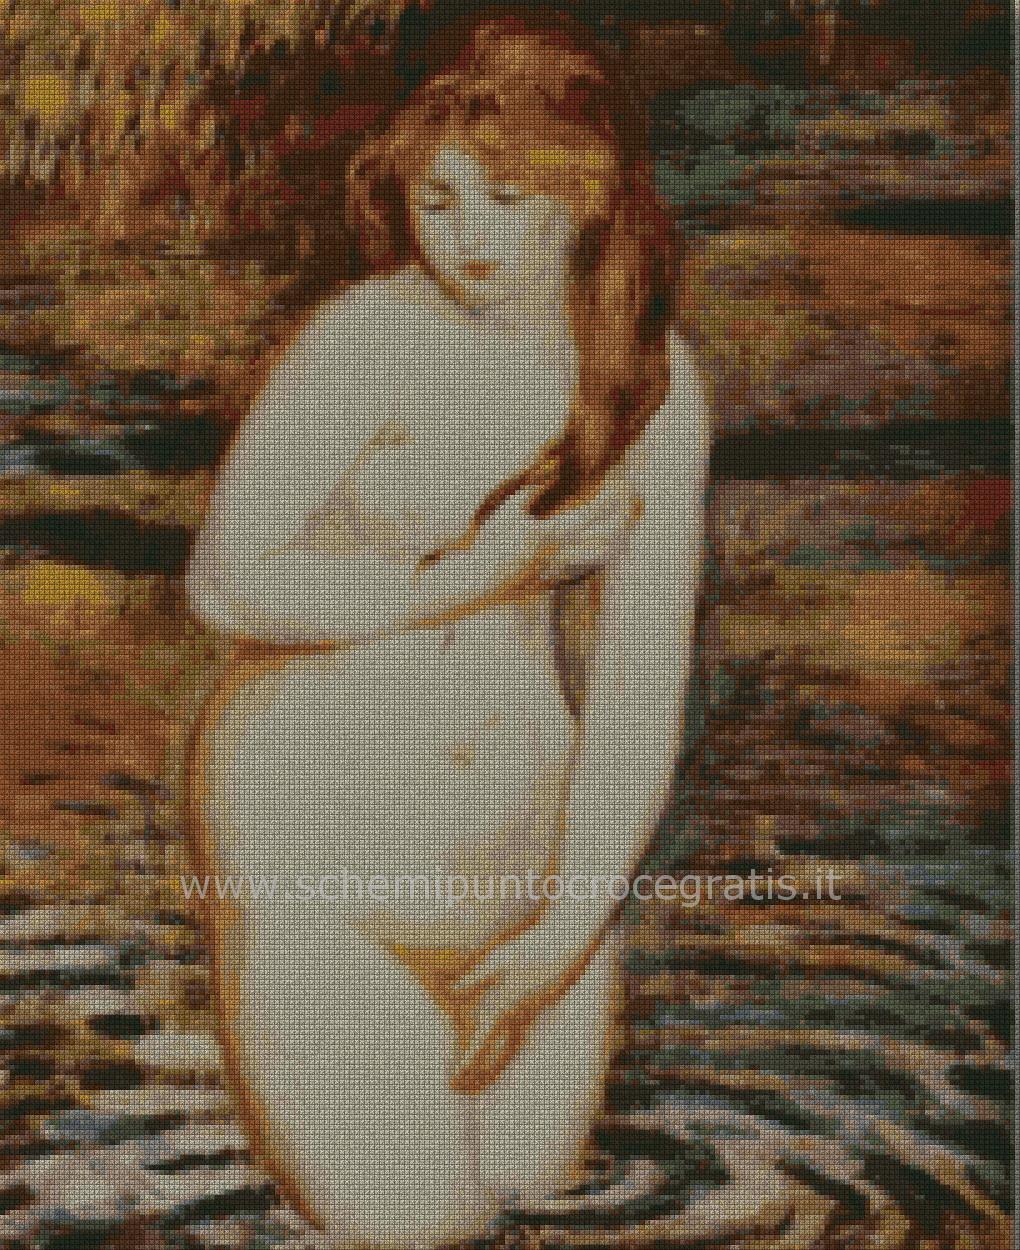 pittori_moderni/renoir/Renoir31.jpg